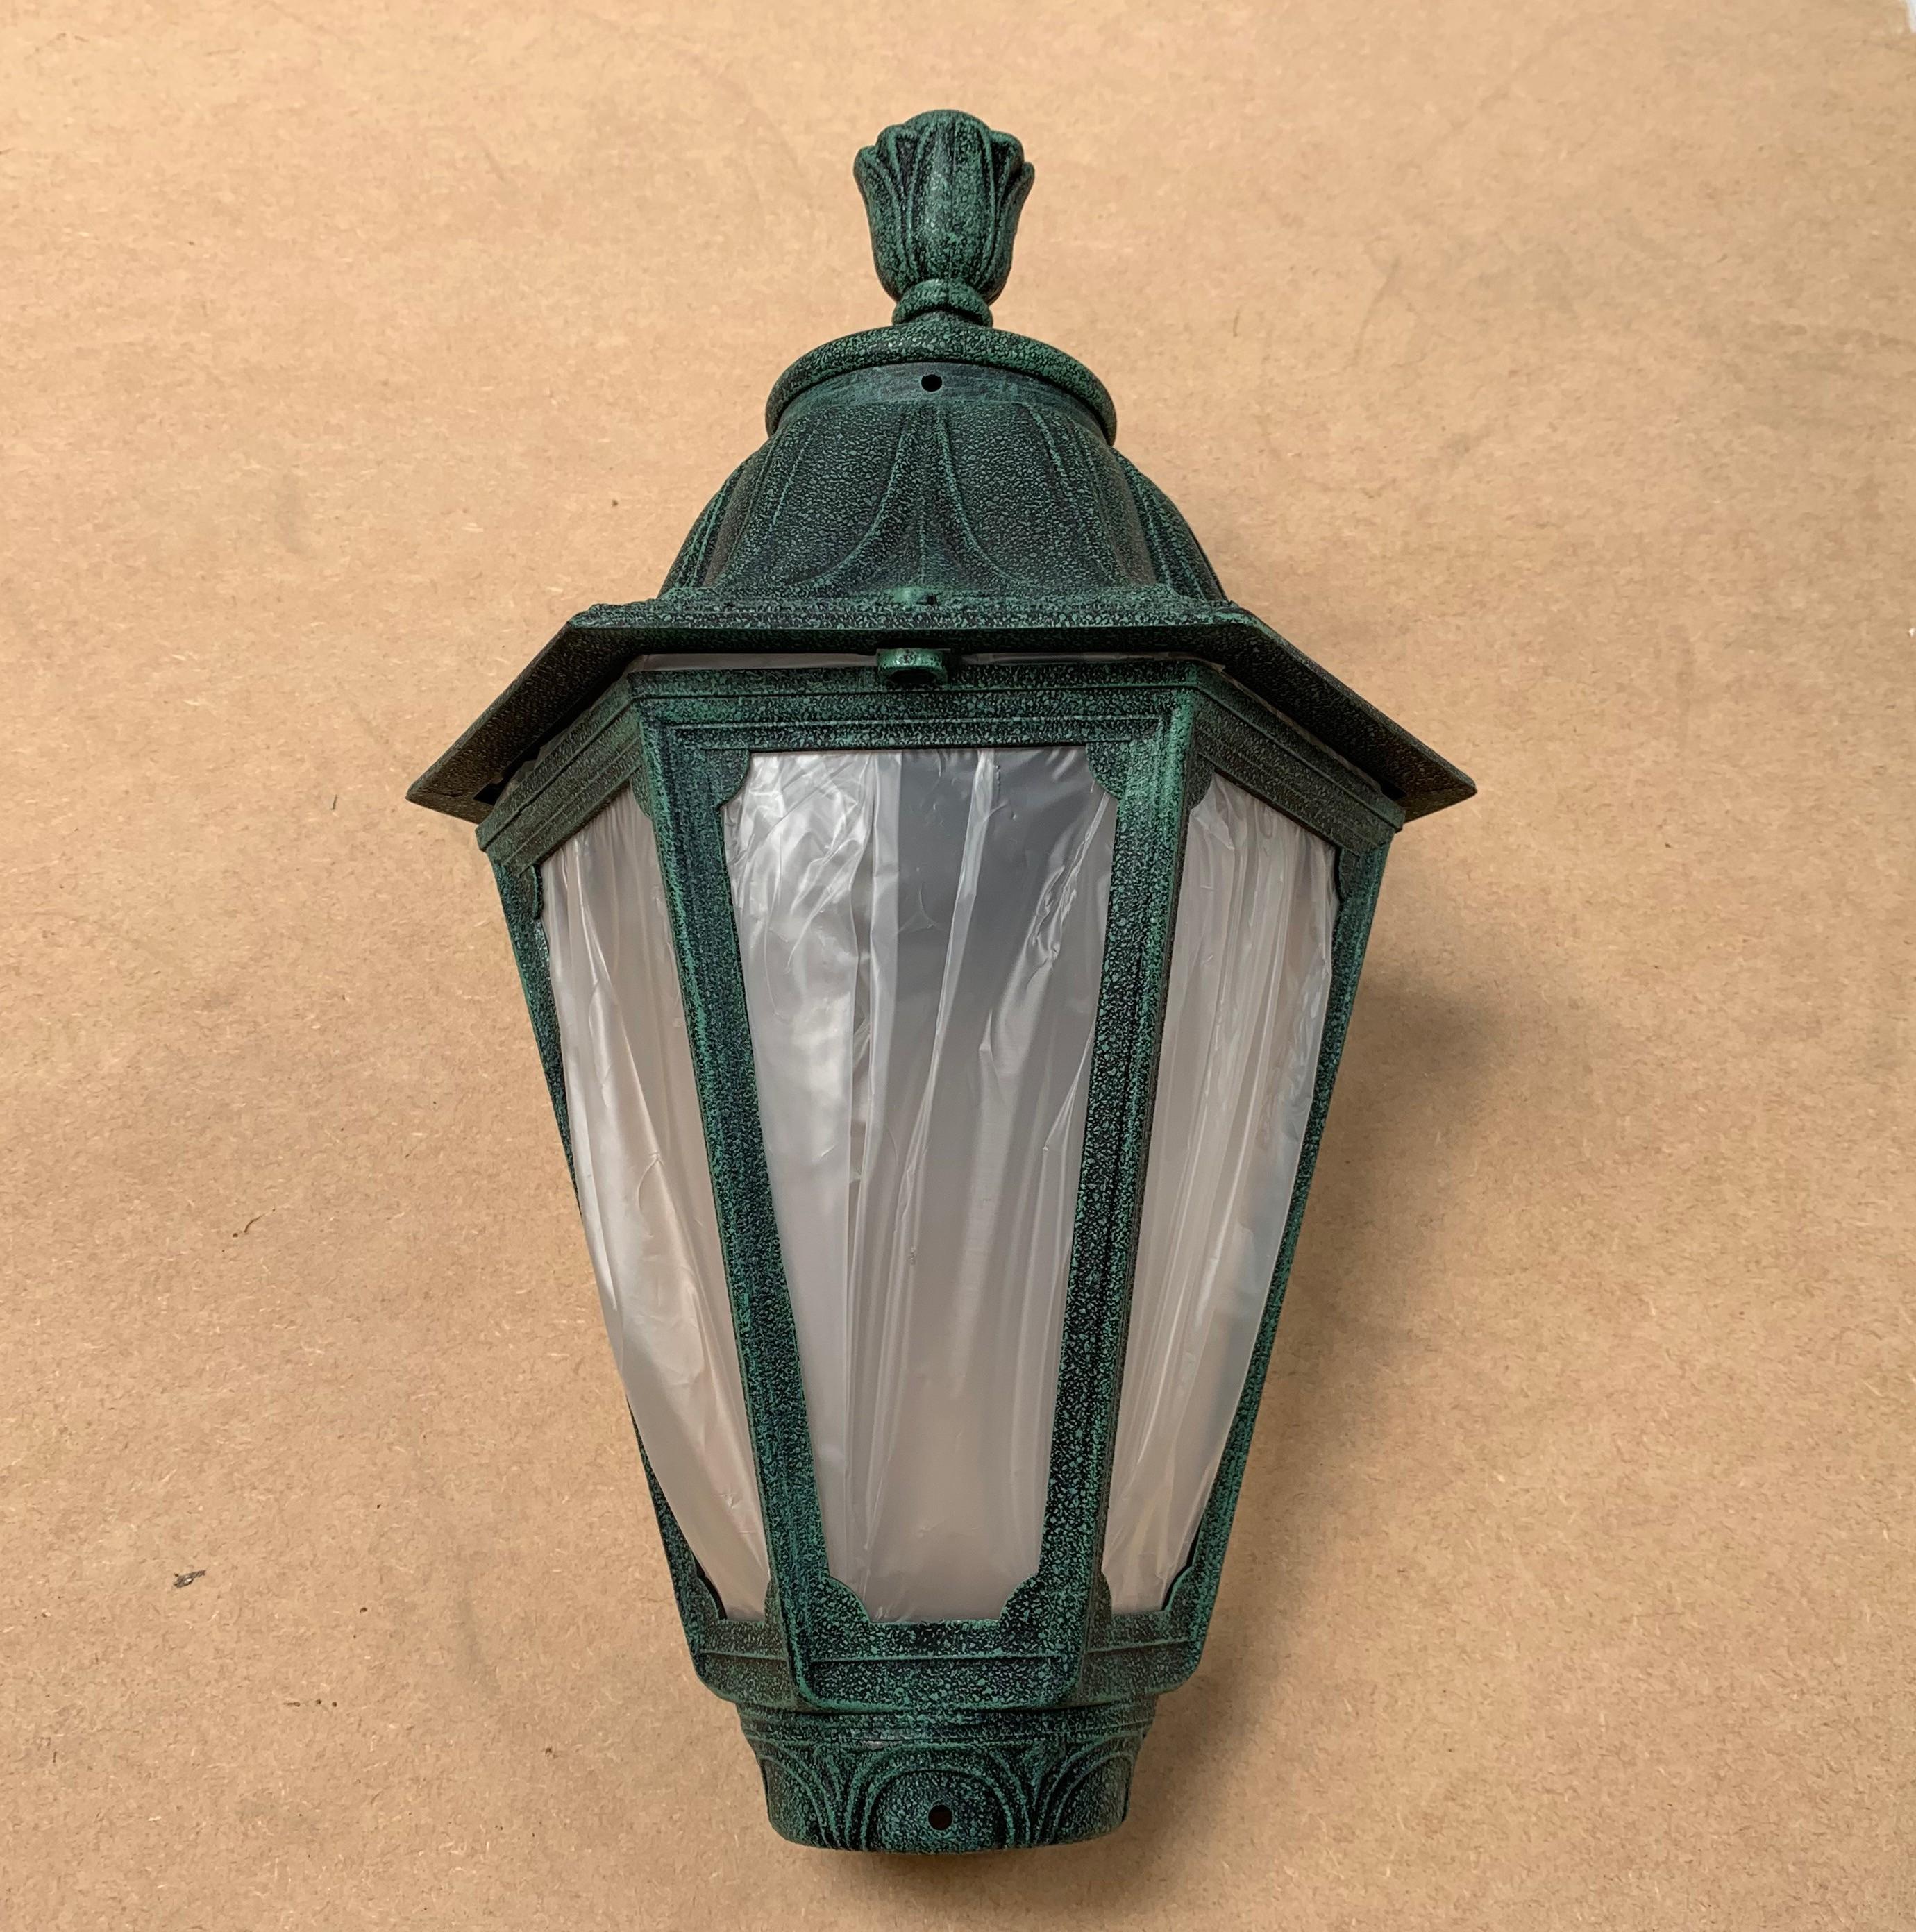 Fumagalli E26.G.GLA Medium Florentine Lantern in Antique Green